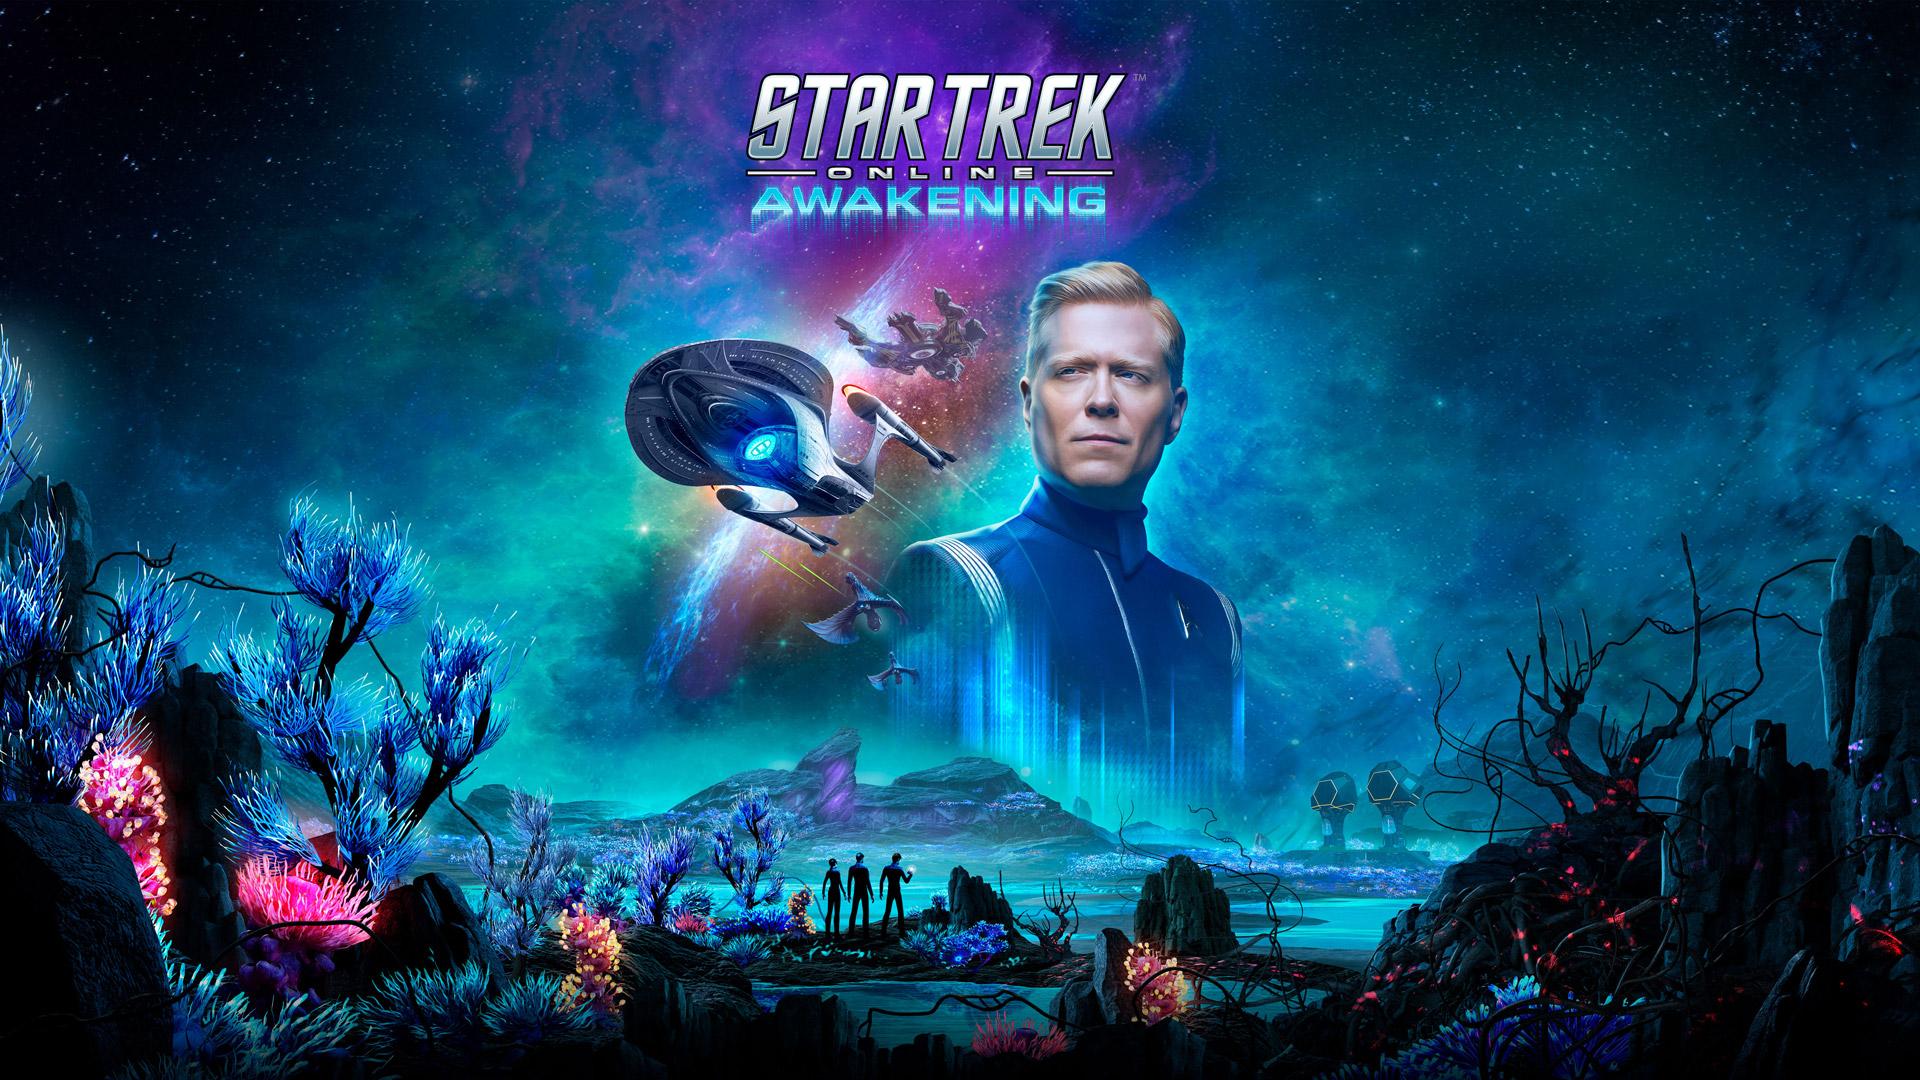 Star Trek Online Wallpaper in 1920x1080